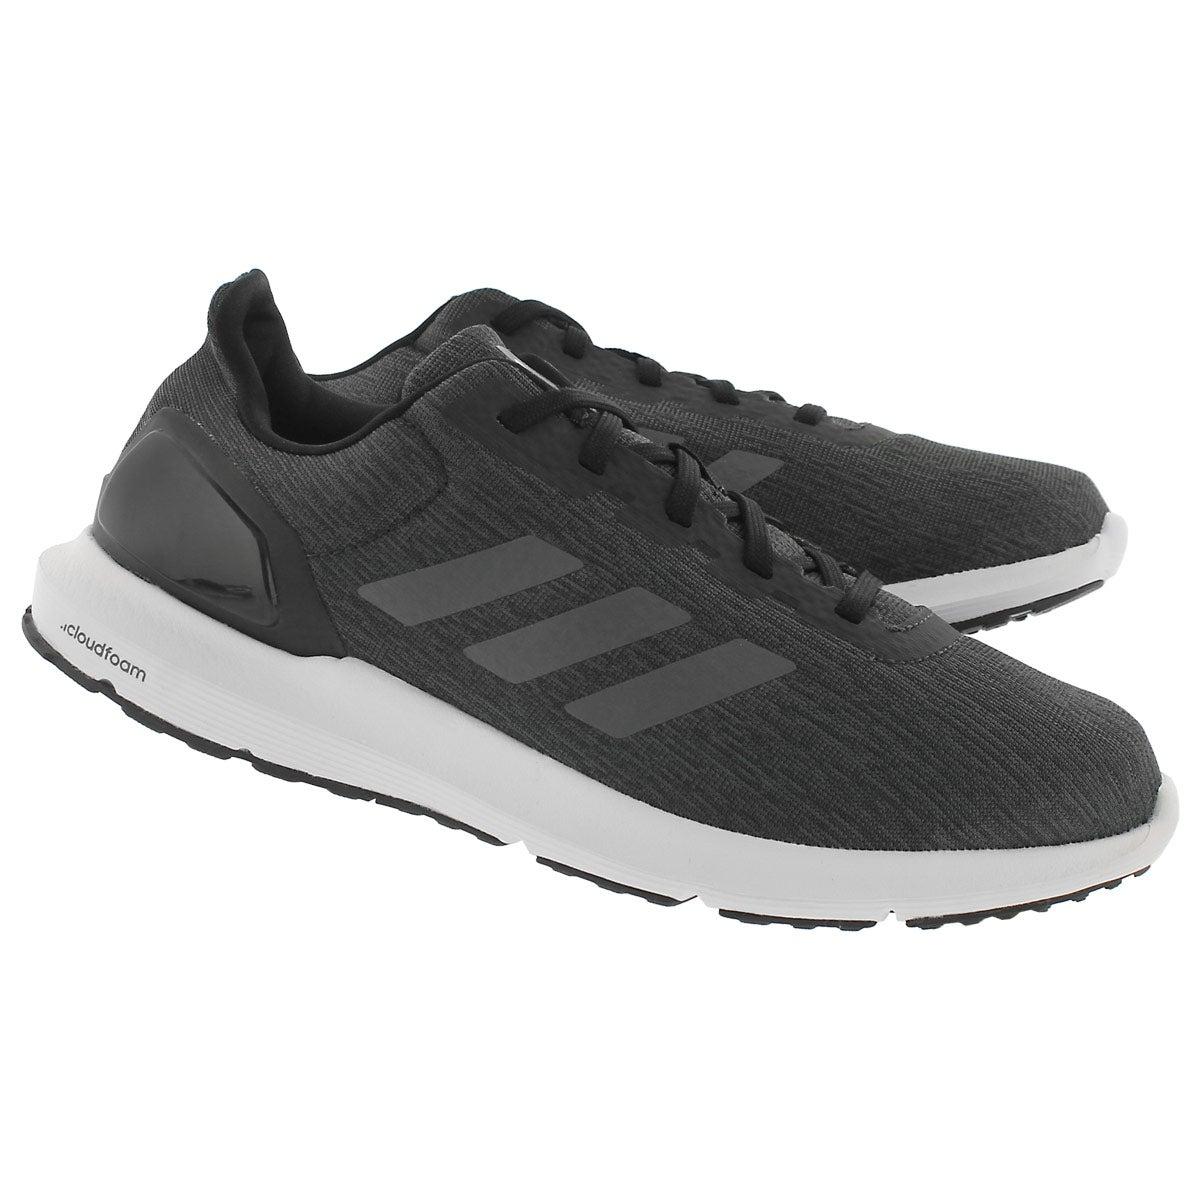 Mns Cosmic 2 blk/blk running shoe